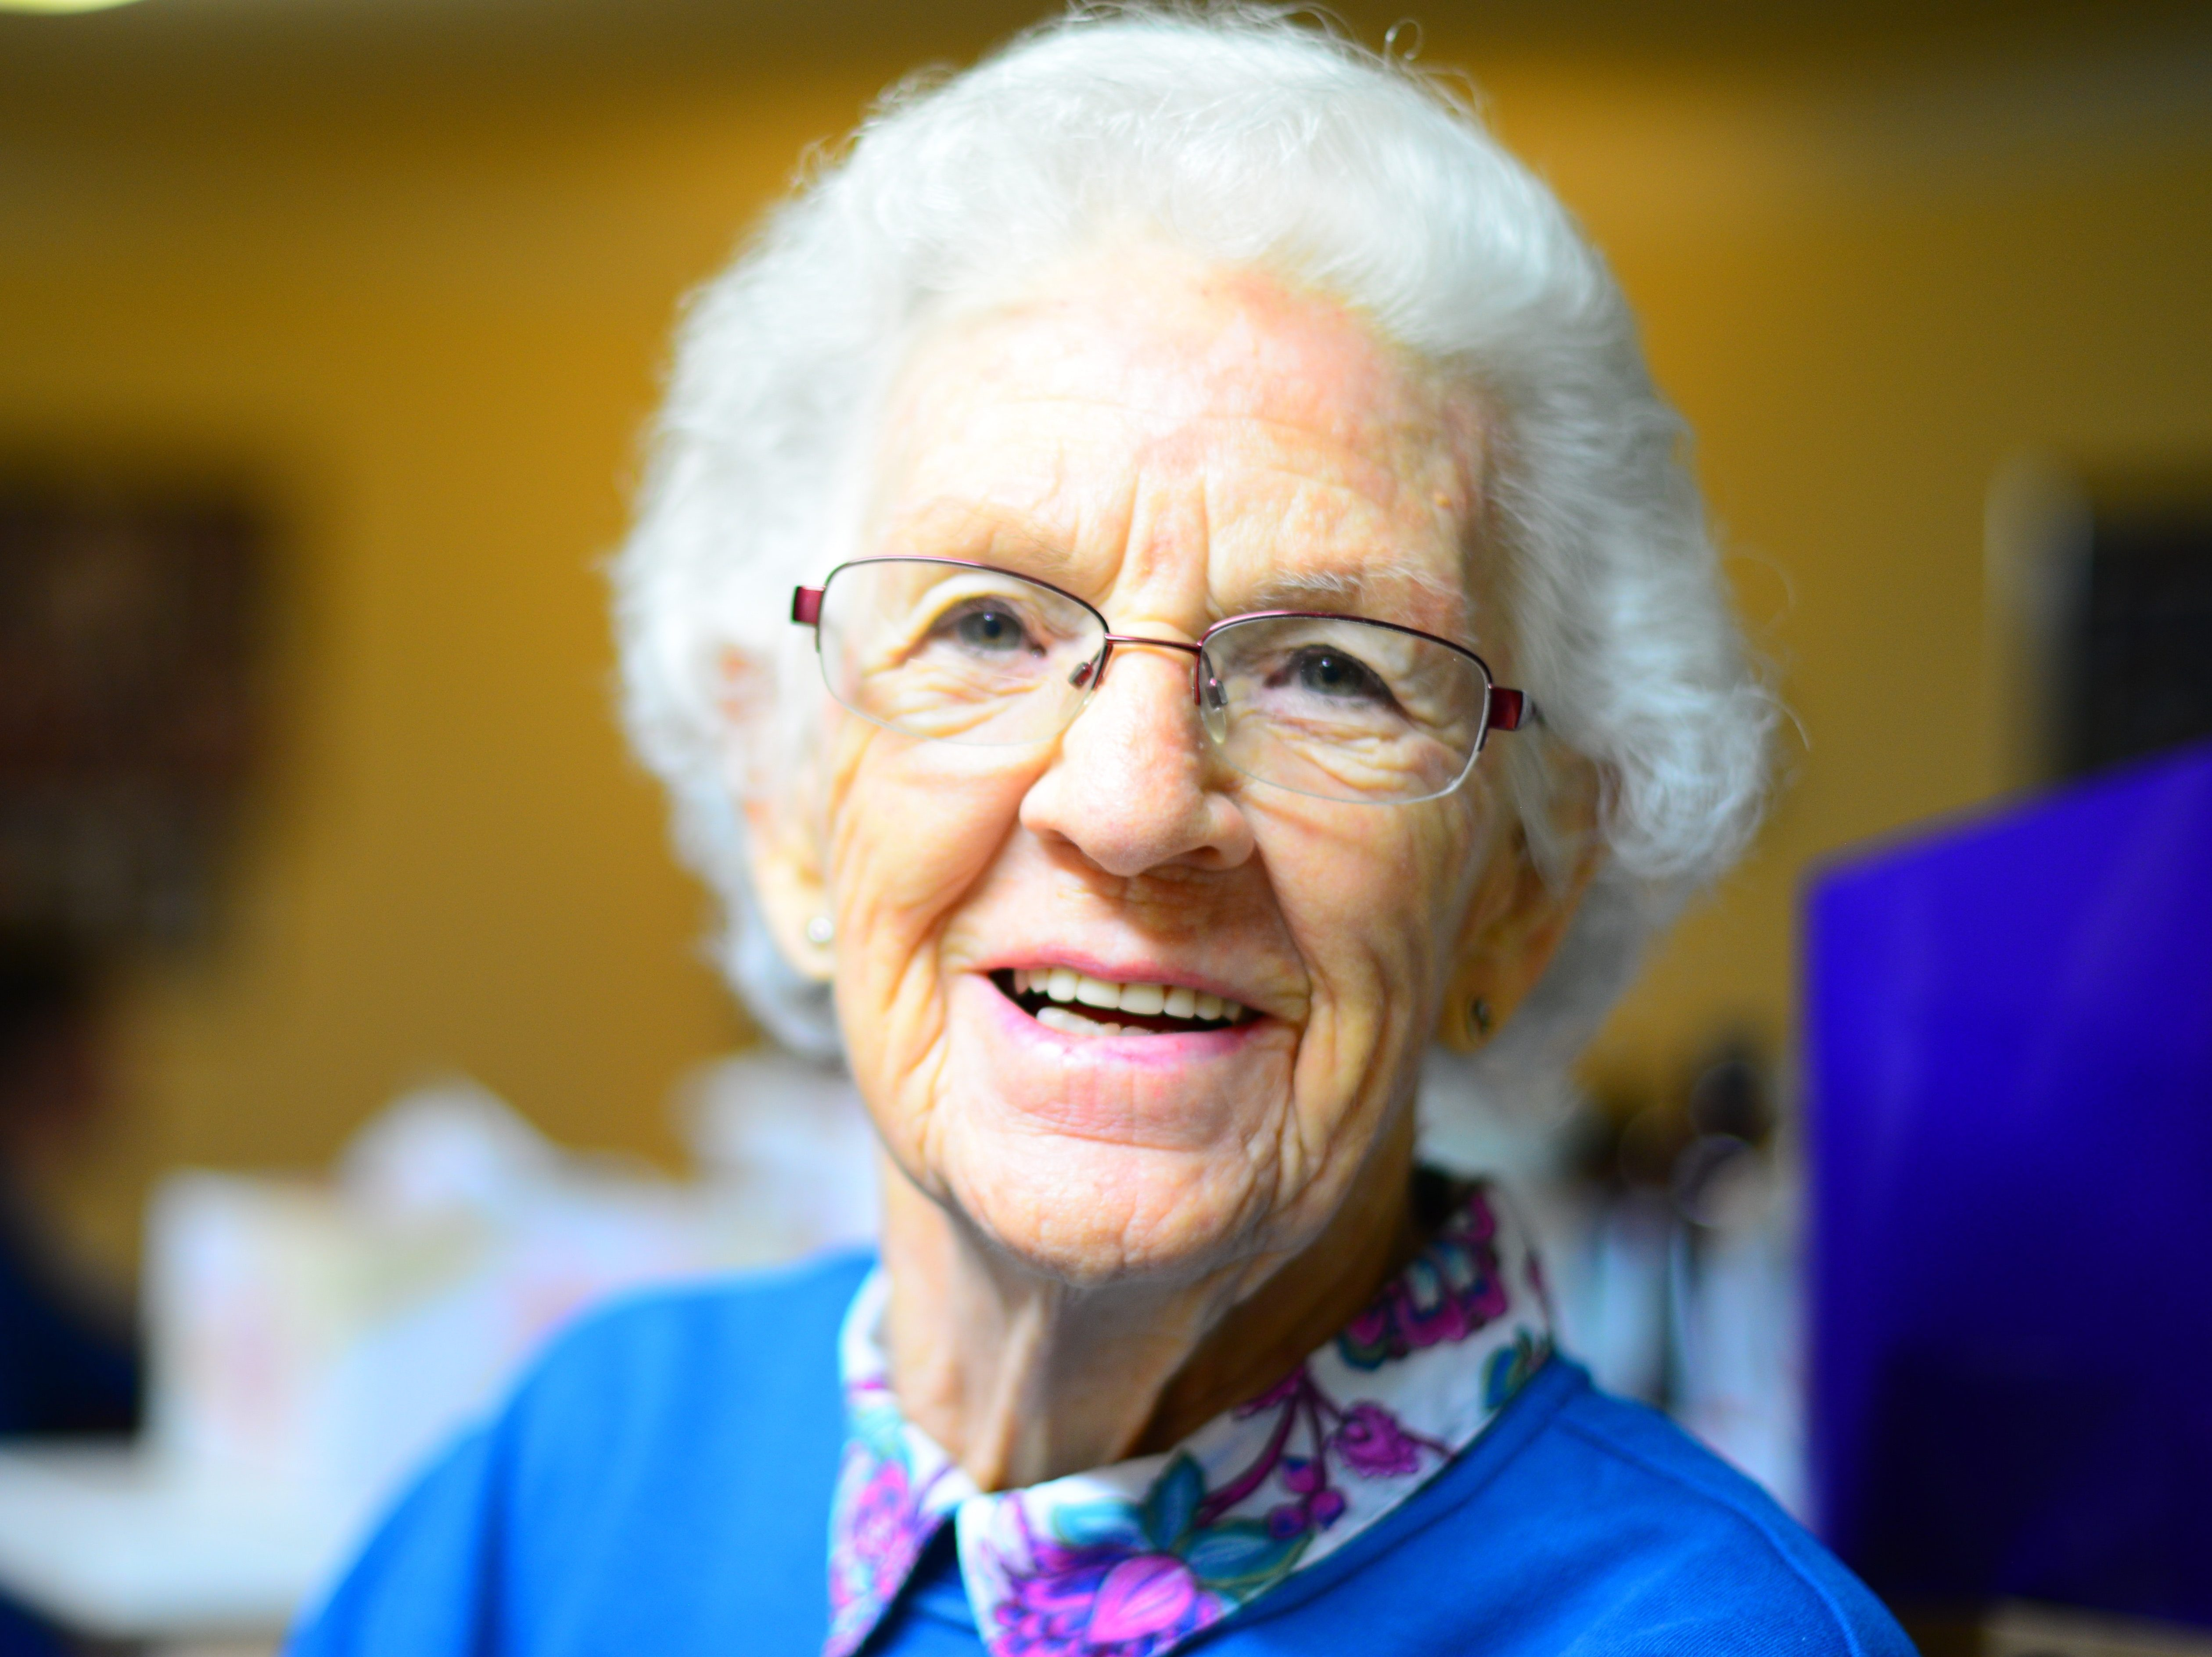 adult-elder-elderly-enjoyment-432722